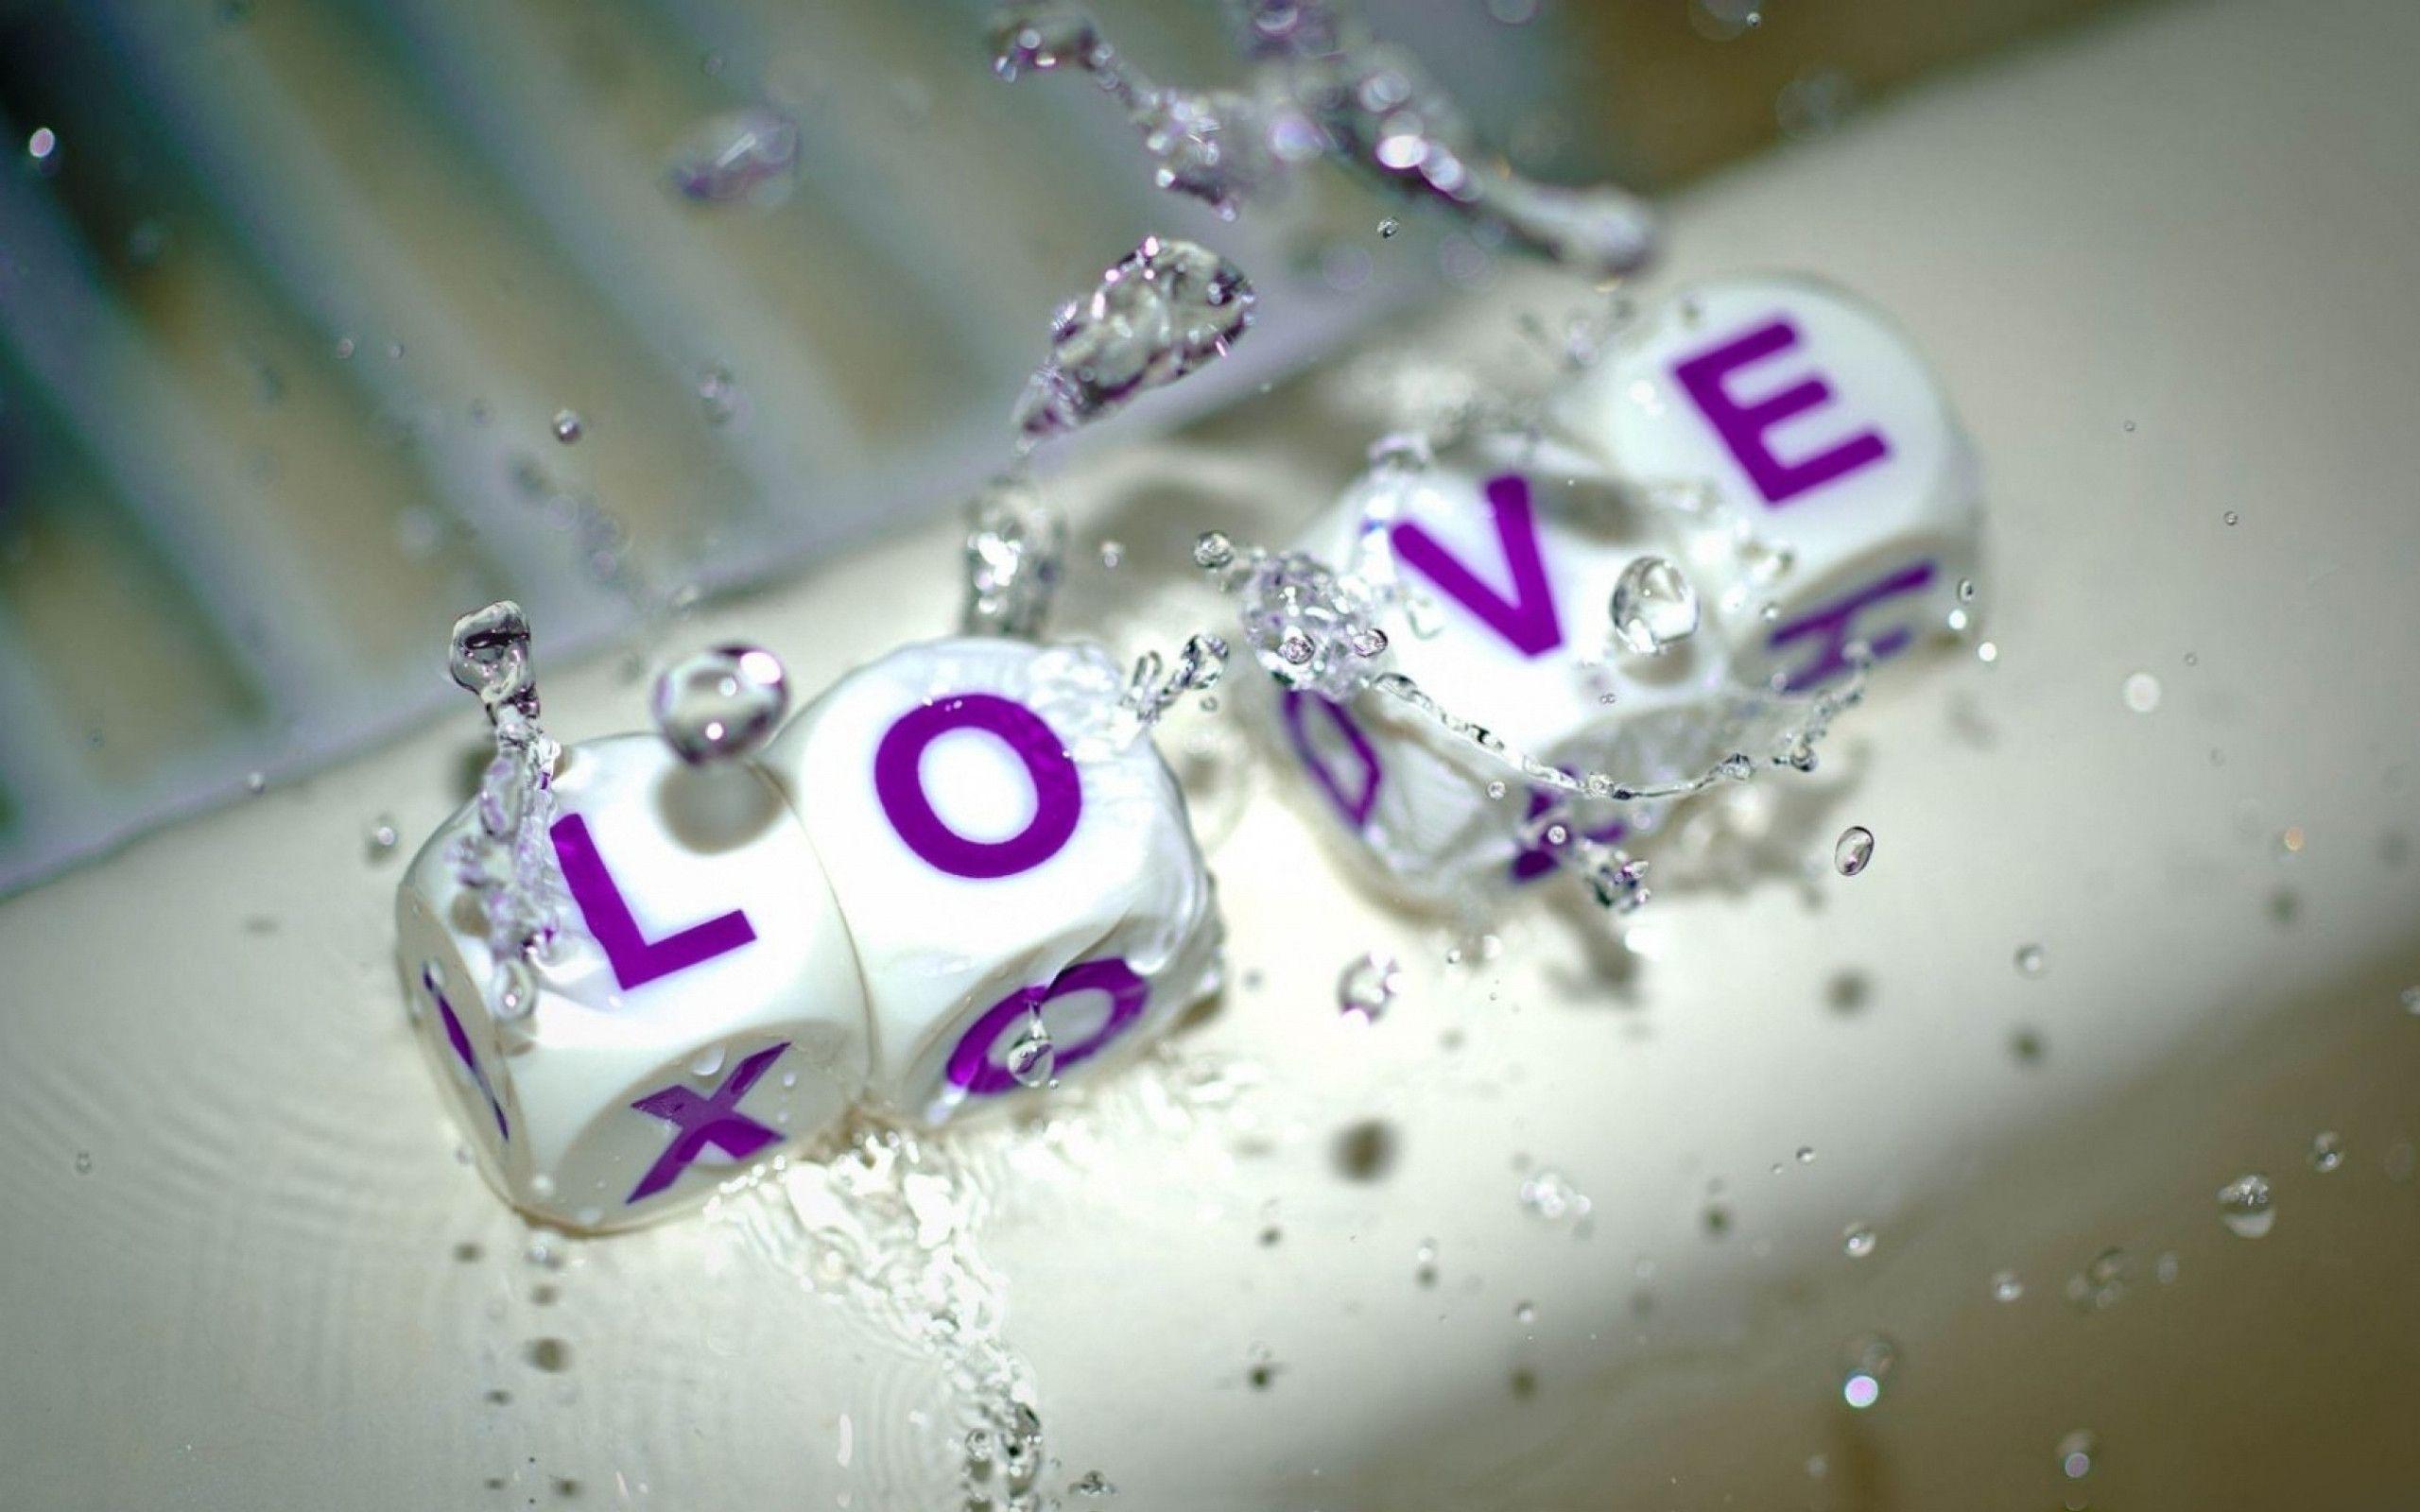 Best Love Wallpapers: Best Love Wallpapers